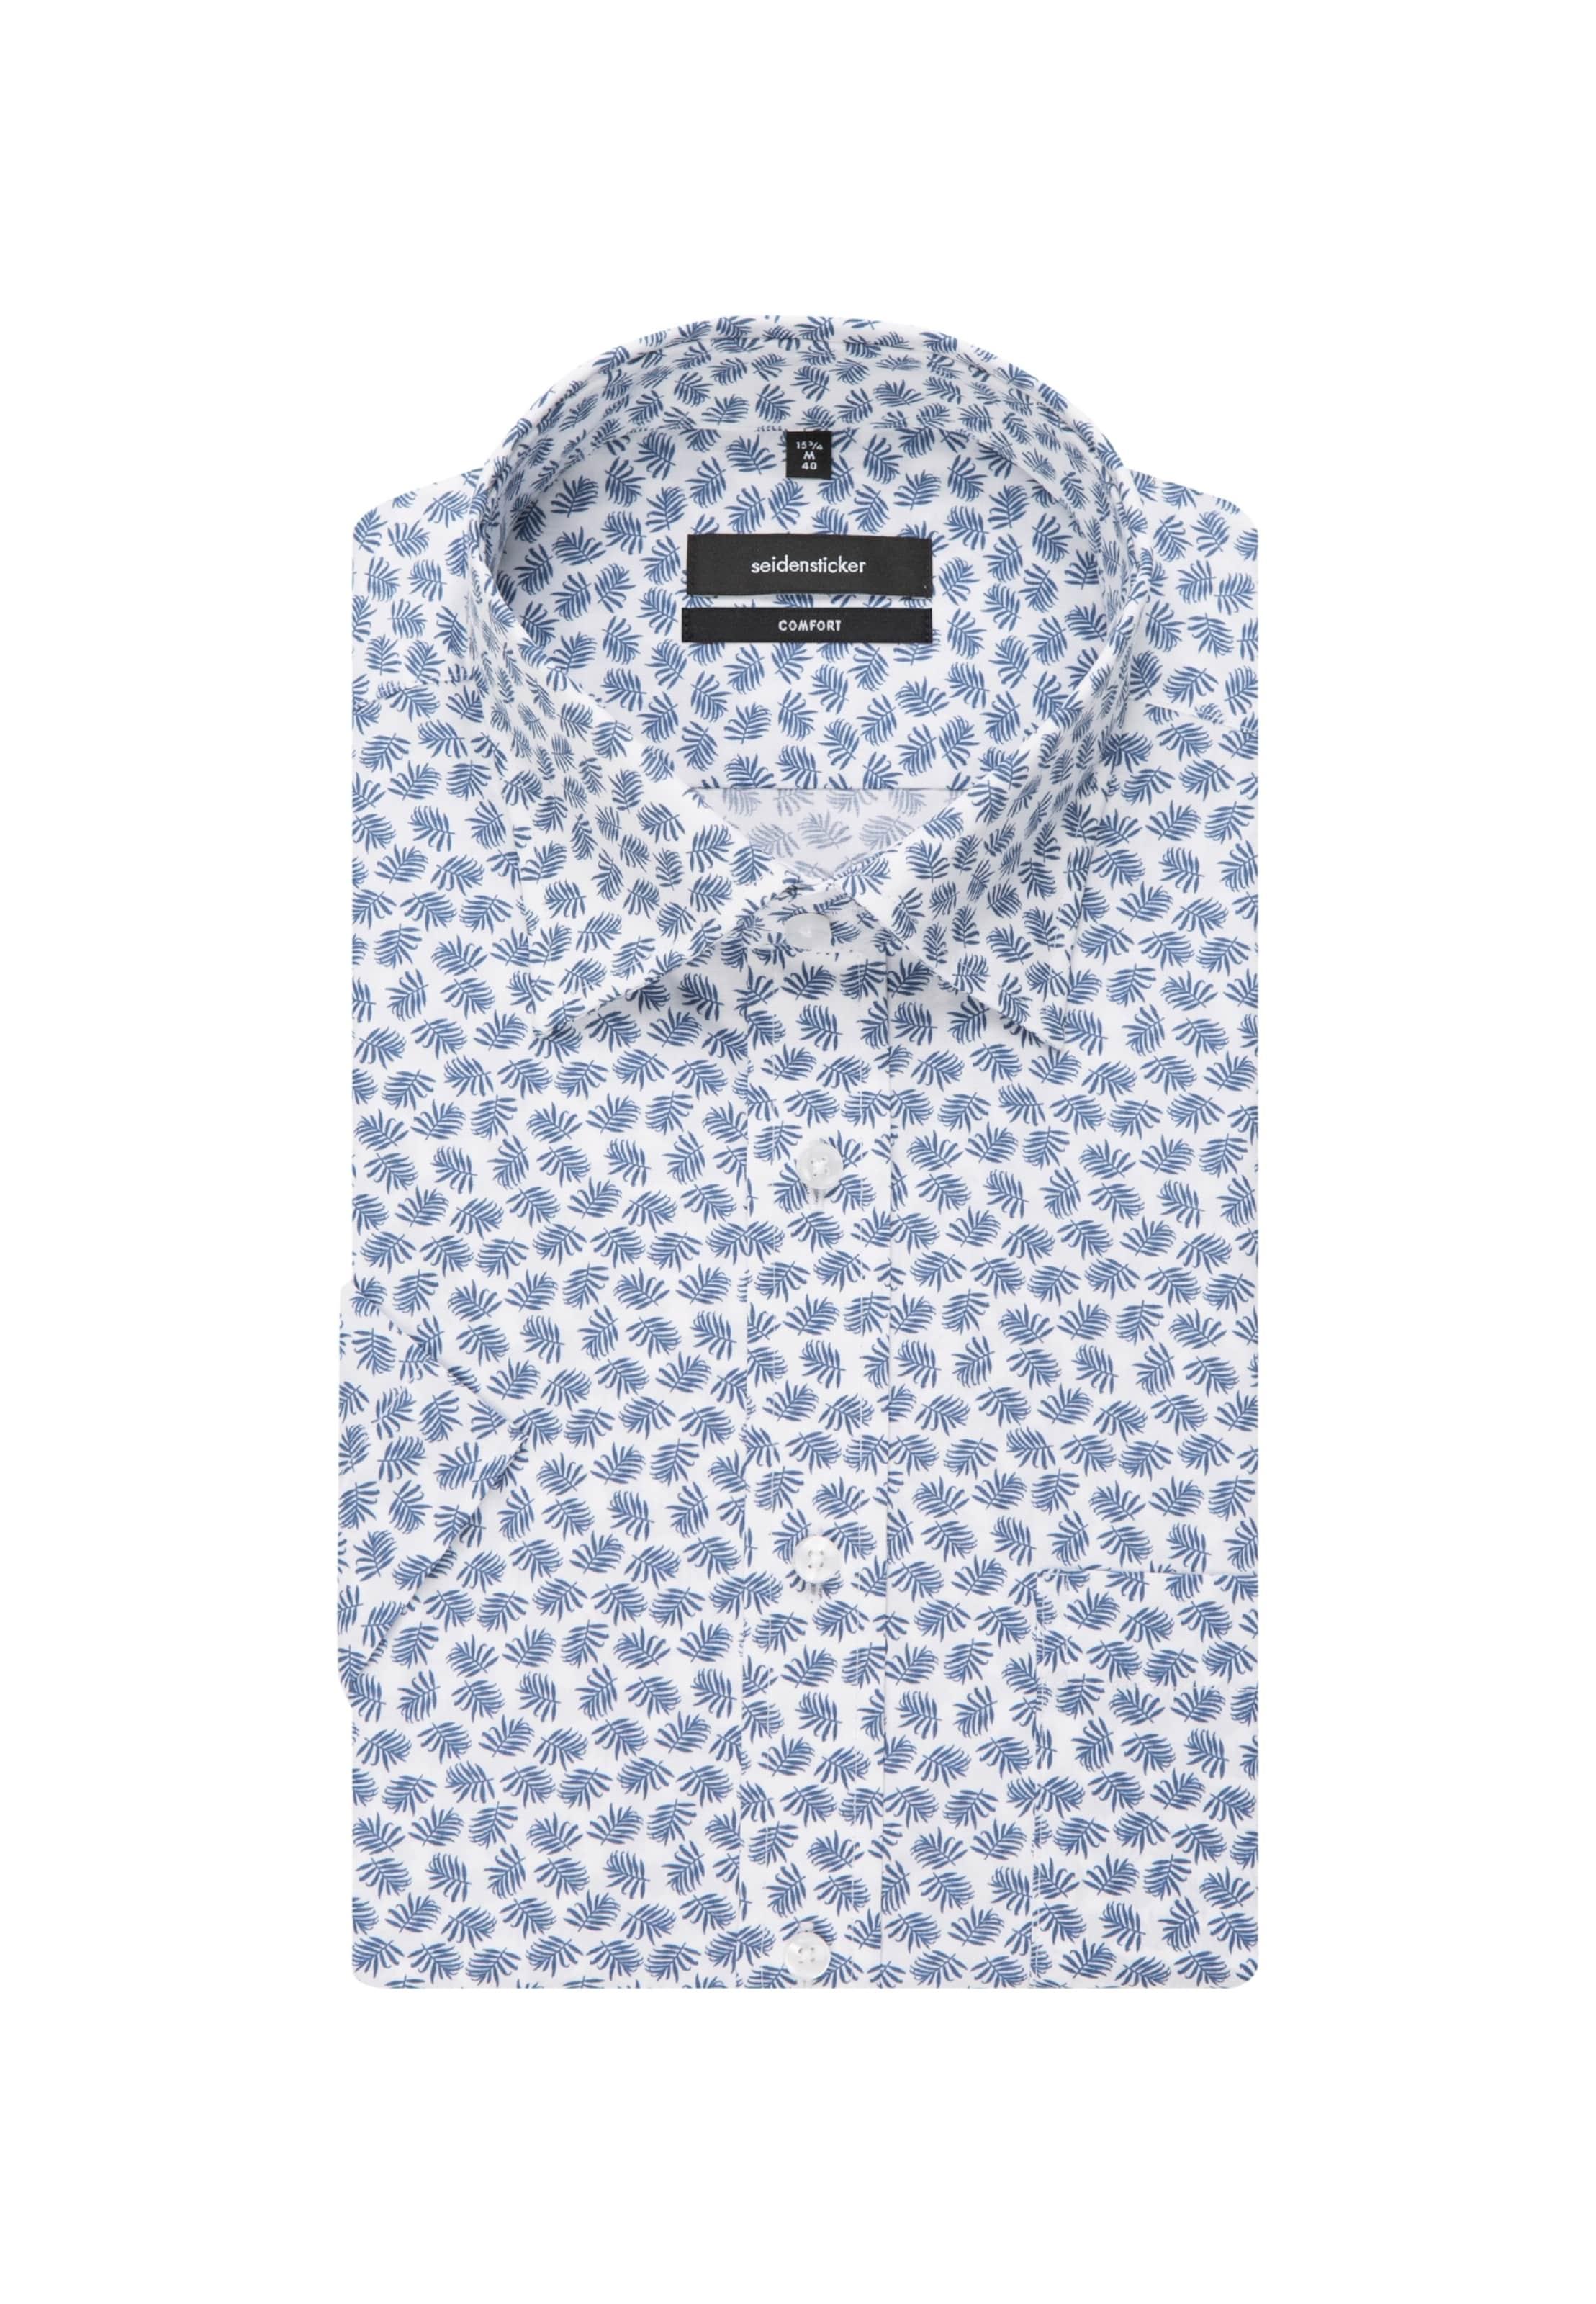 Seidensticker Comfort BlauWeiß ' In Hemd Rj5LA4